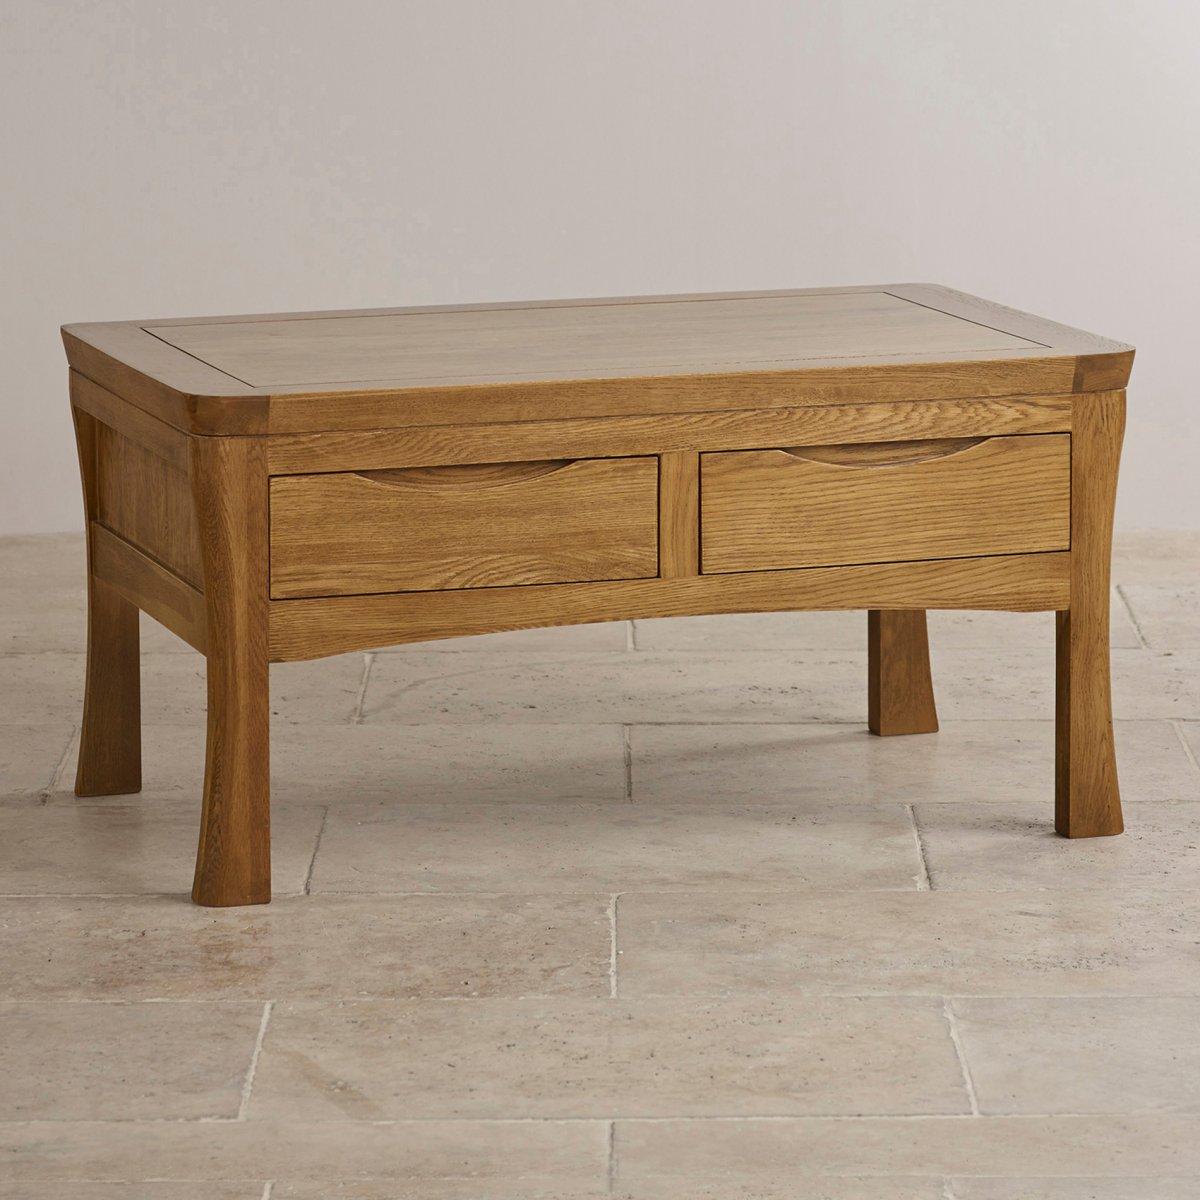 Orrick 4 Drawer Coffee Table In Rustic Oak Oak Furniture